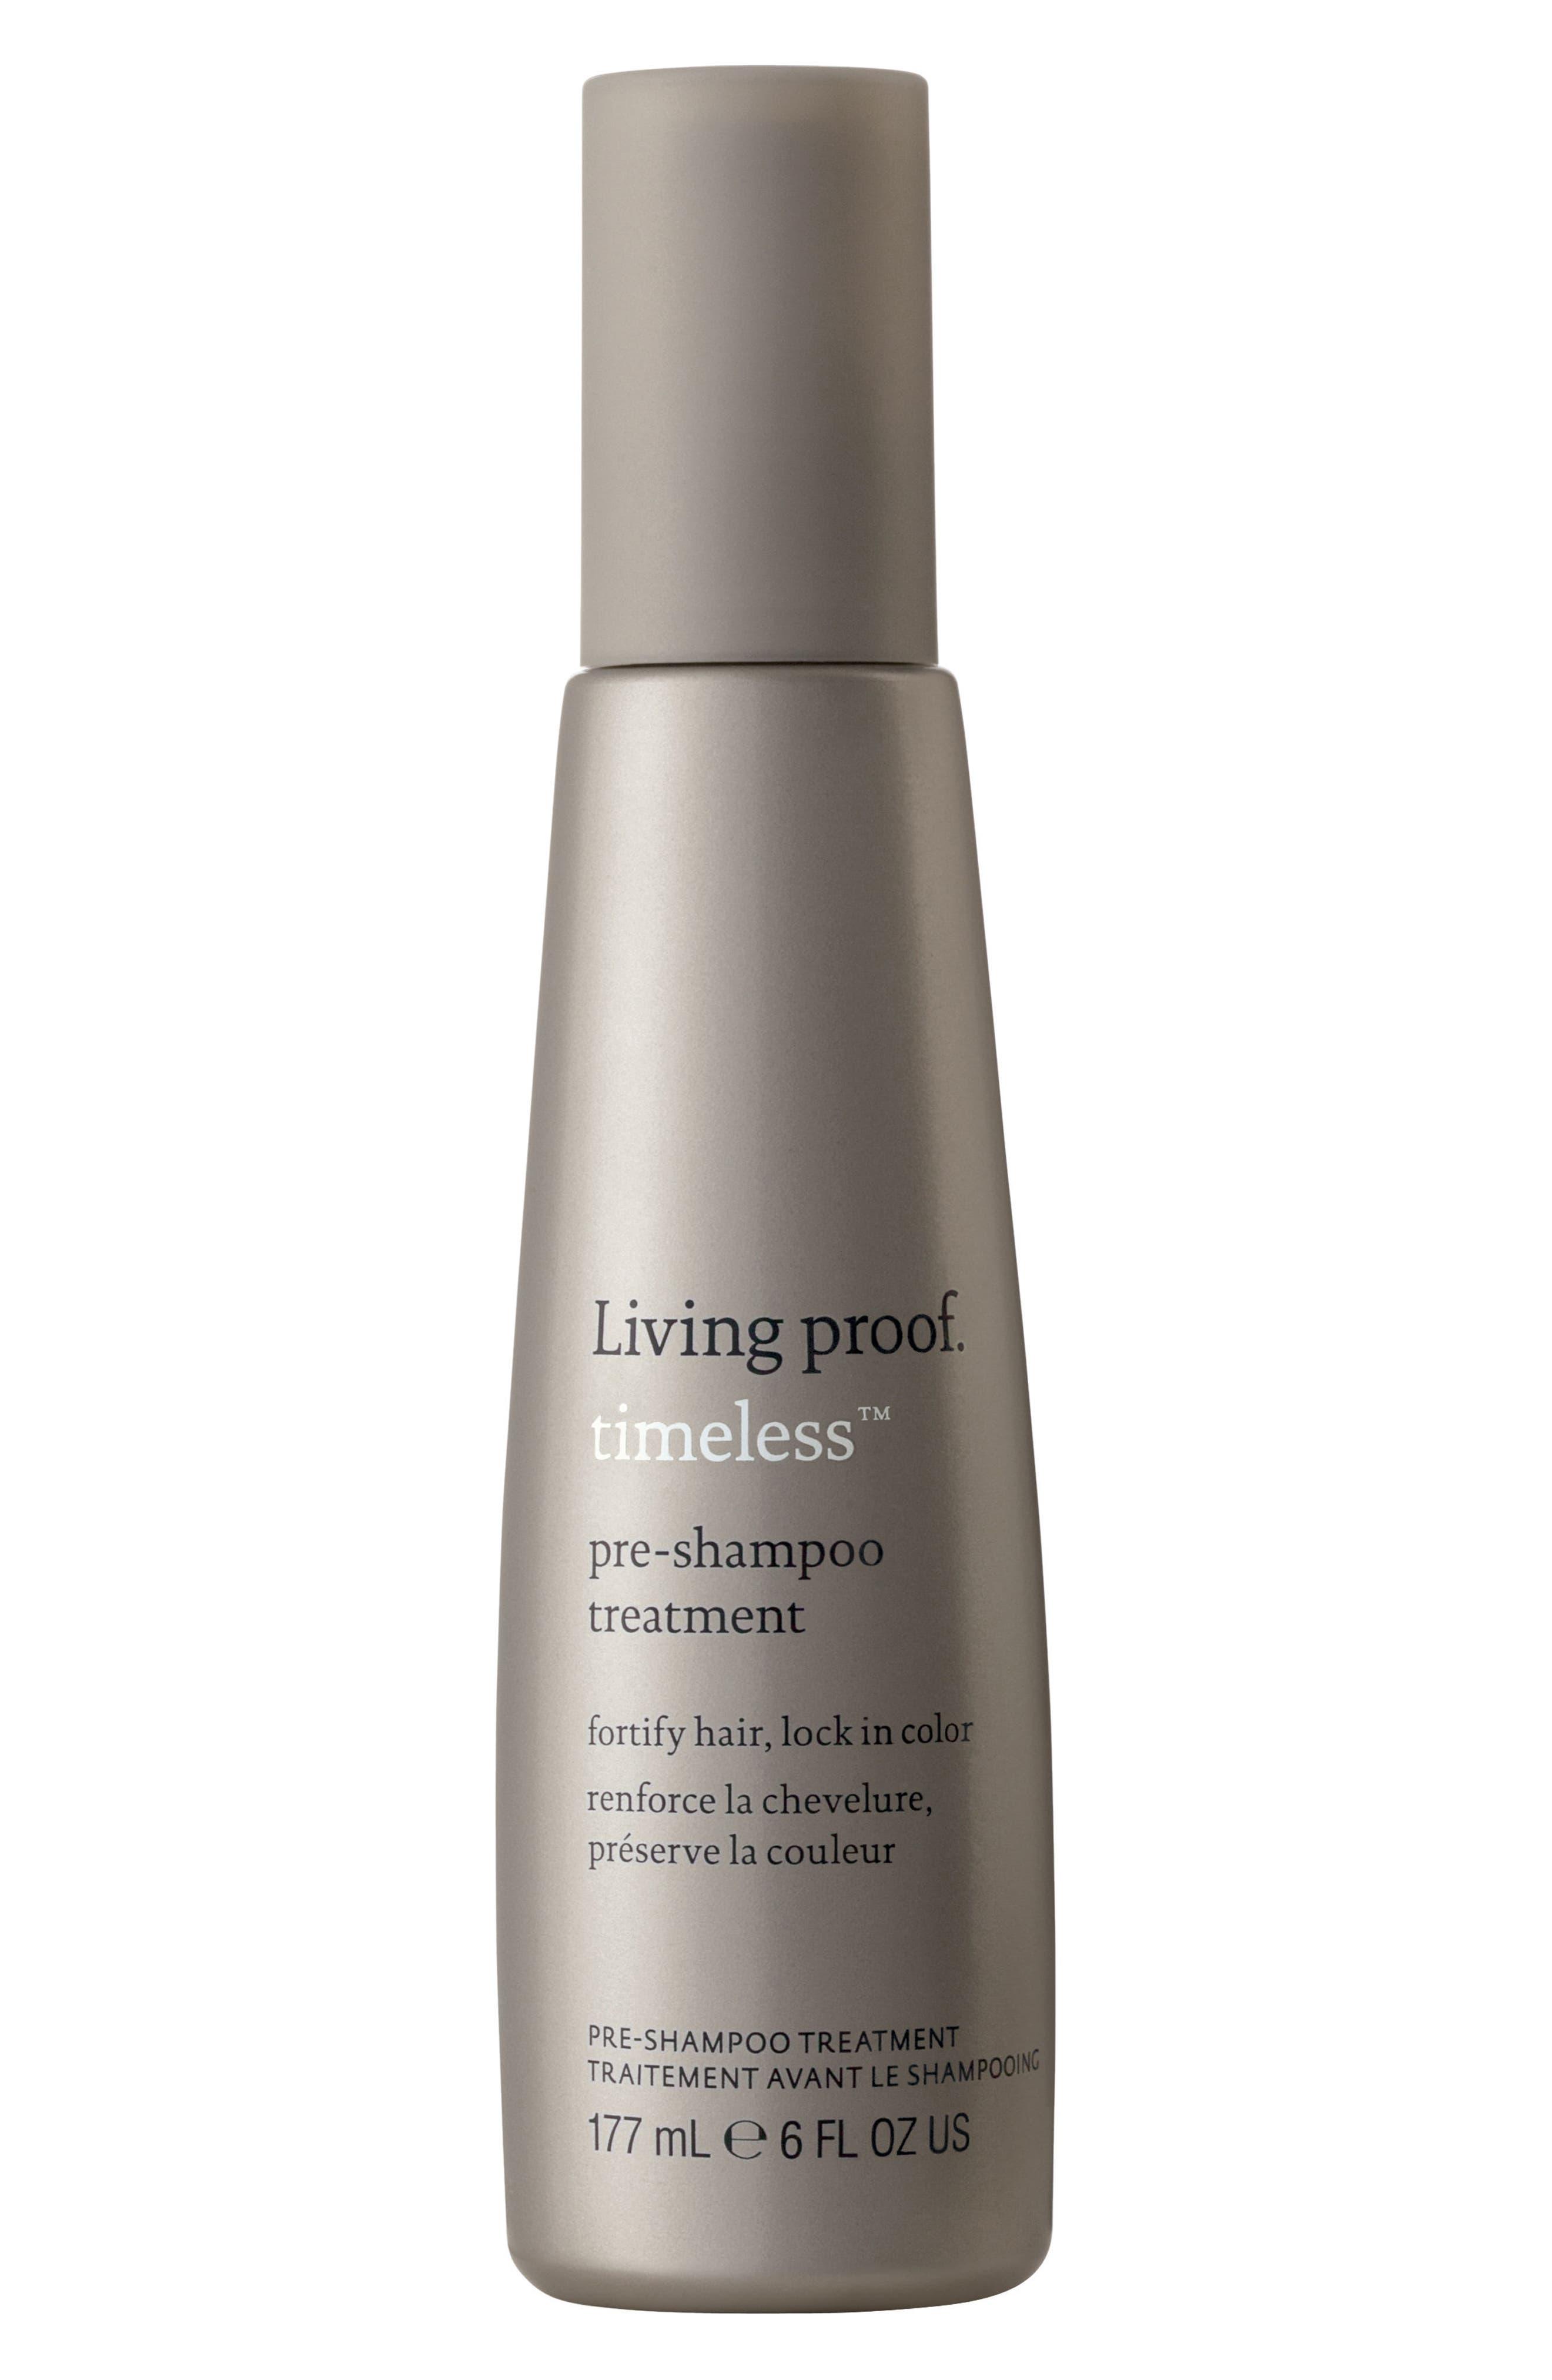 Living proof® Timeless Pre-Shampoo Treatment